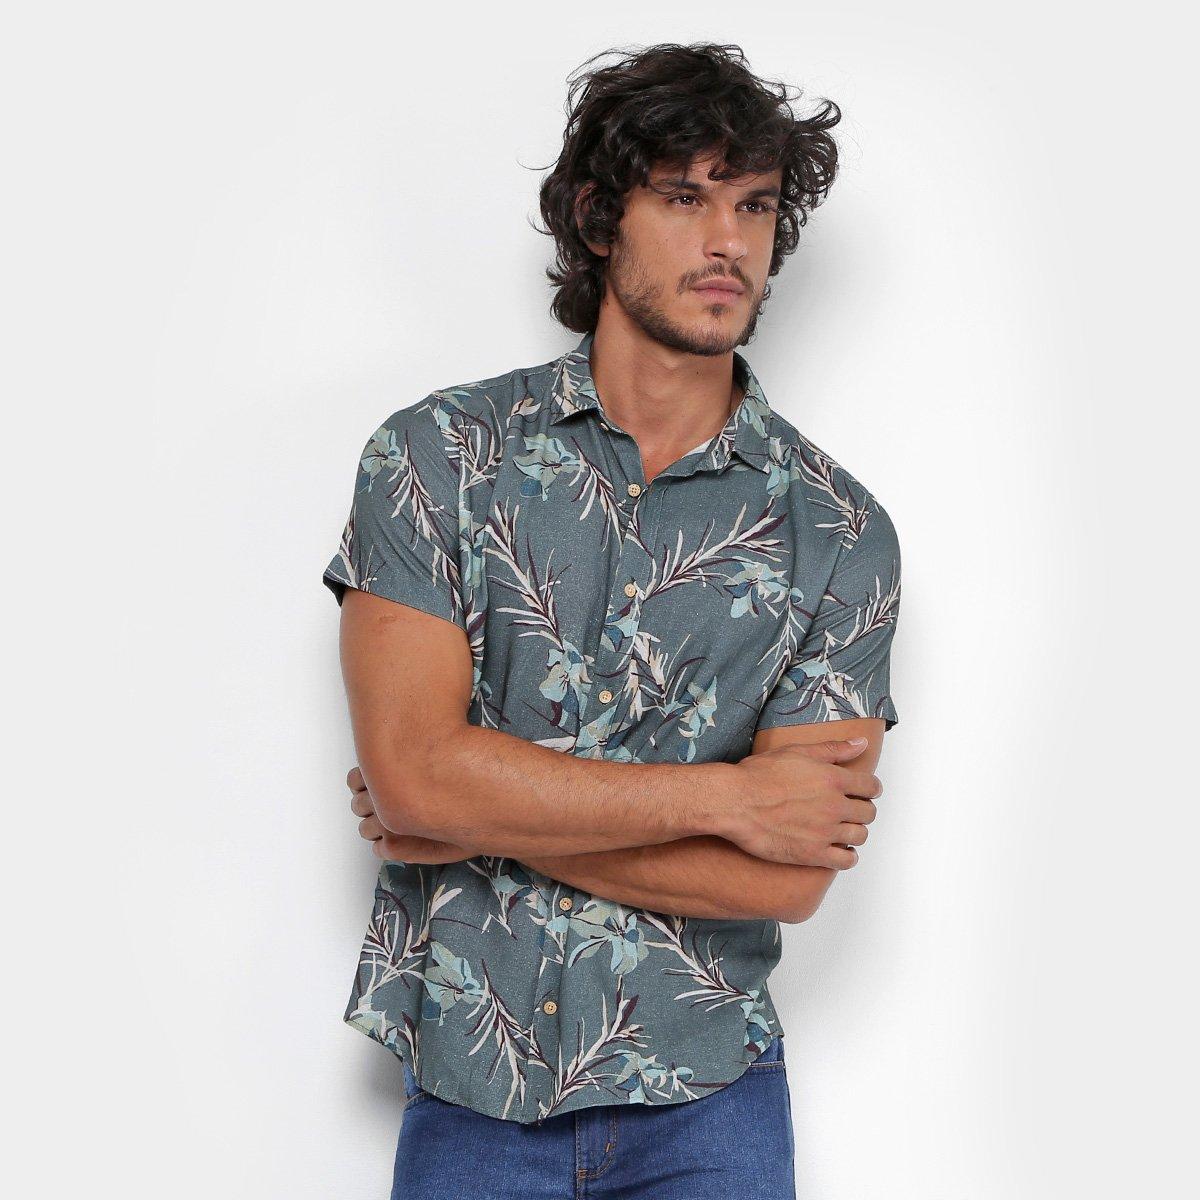 e98d13555d Camisa Reserva Estampada Floral Manga Curta Masculina - Verde Militar -  Compre Agora